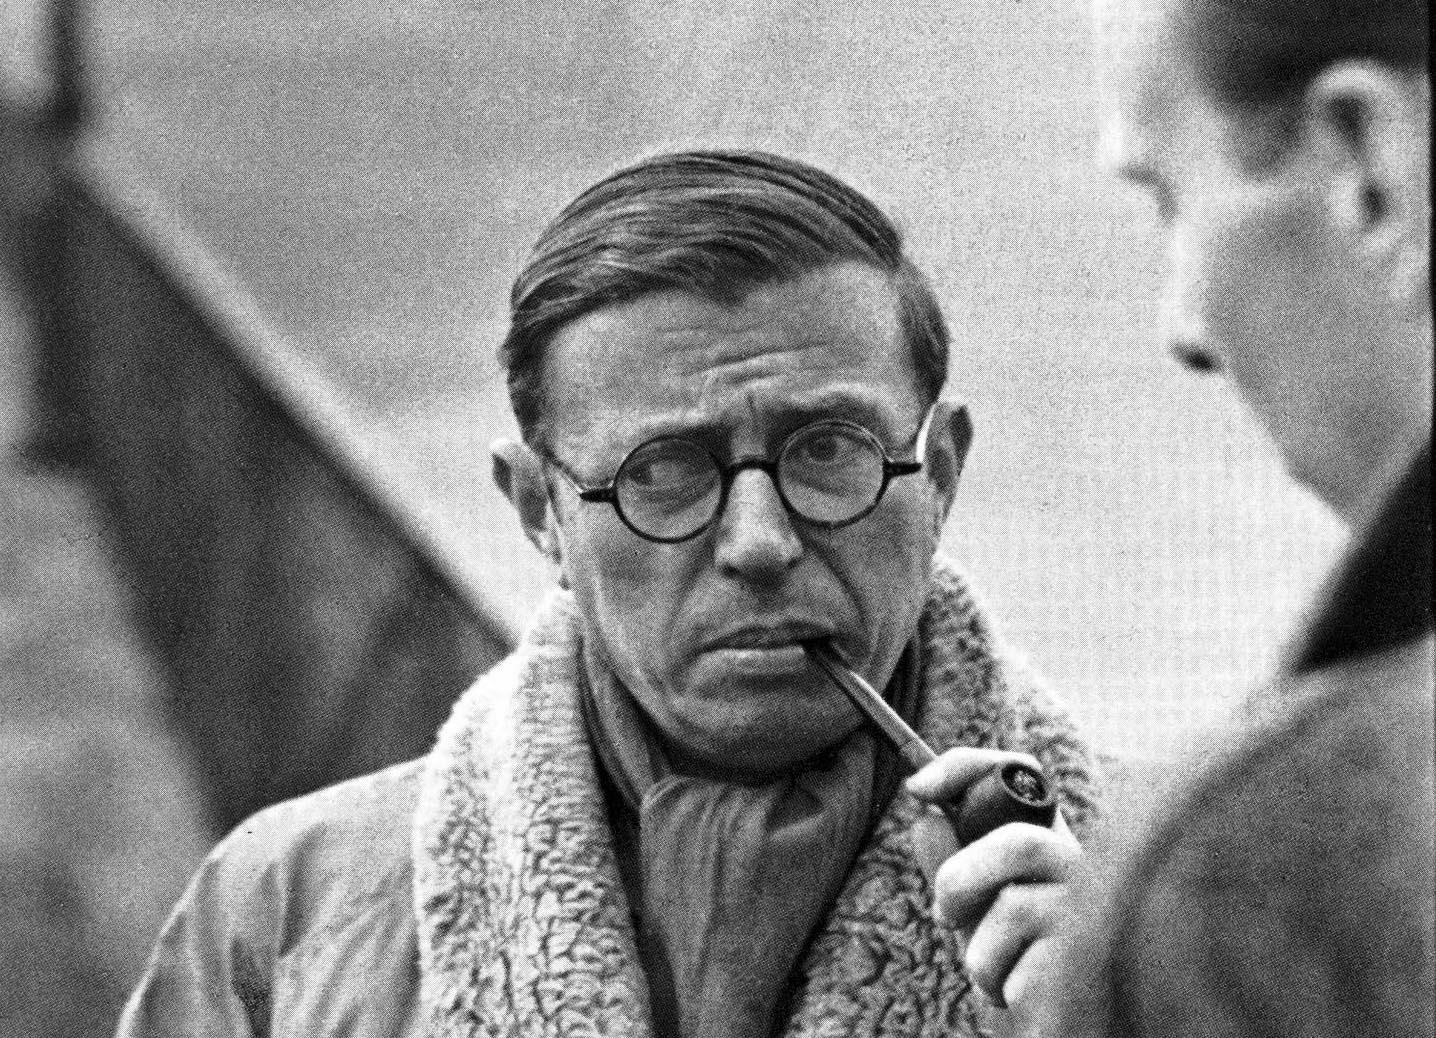 Jean - Paul Sartre